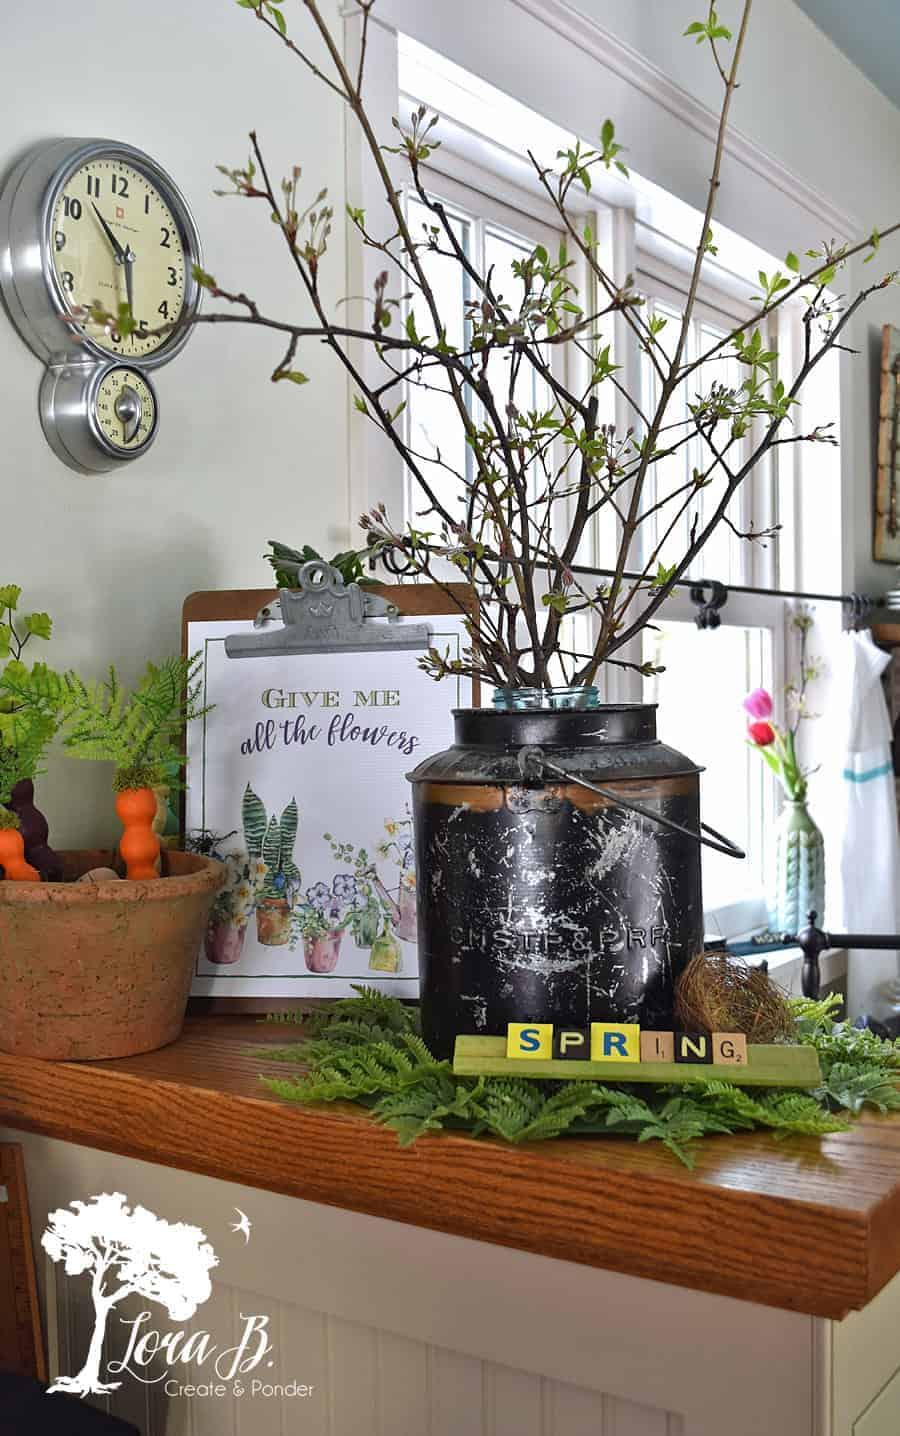 Vintage Farmhouse Spring Decor In The Kitchen Lora B Create Ponder